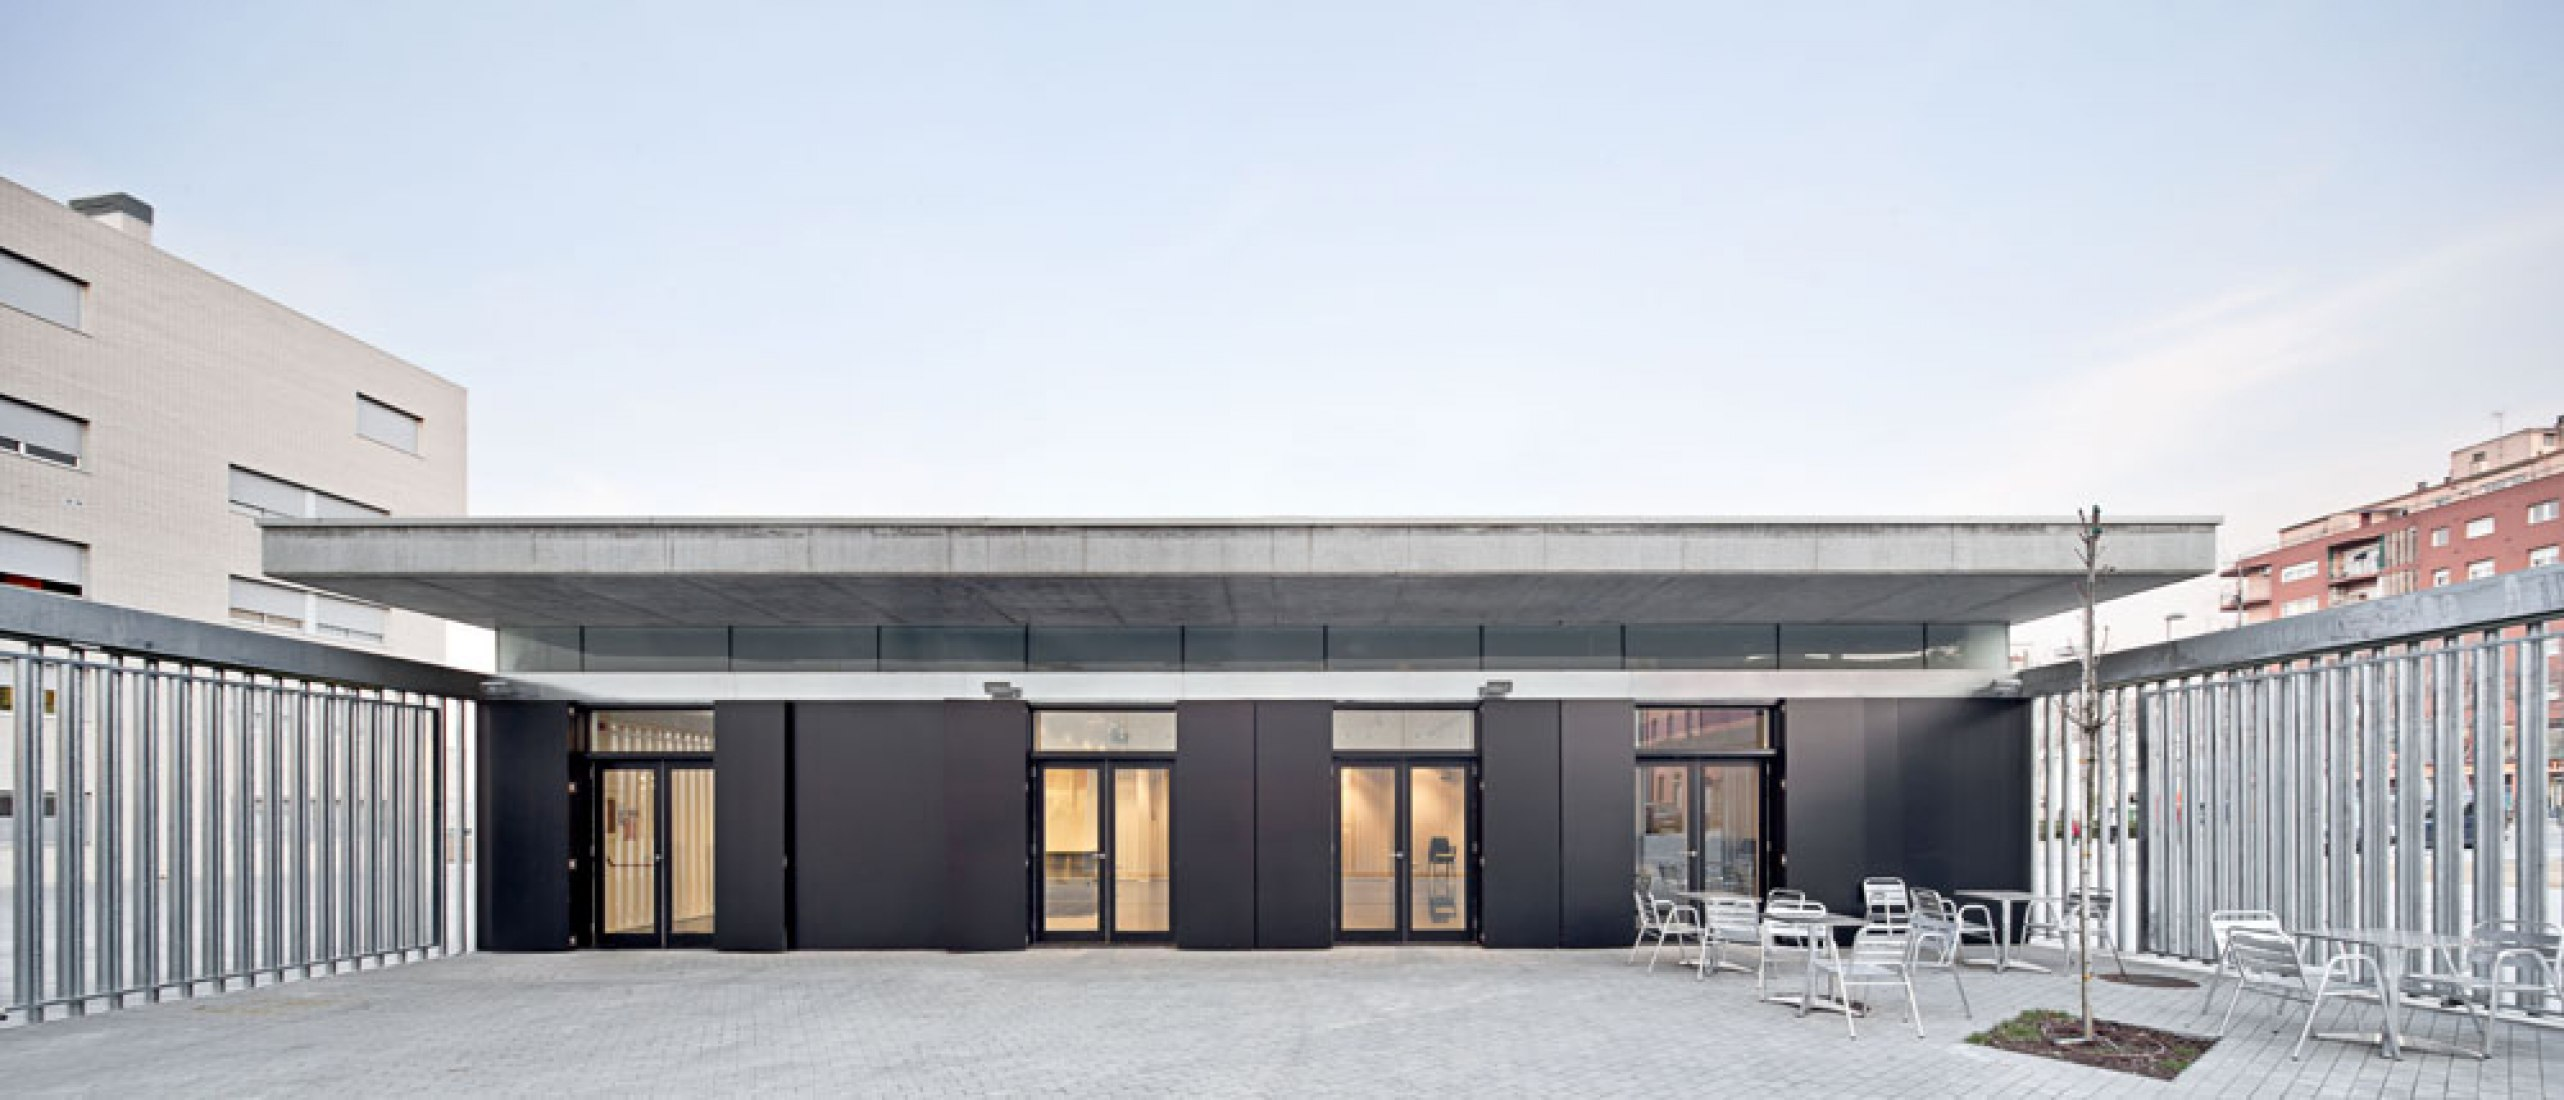 Cafetería. Fábrica Marfà por Ravetllat-Ribas. Fotografía © Adrià Goula.